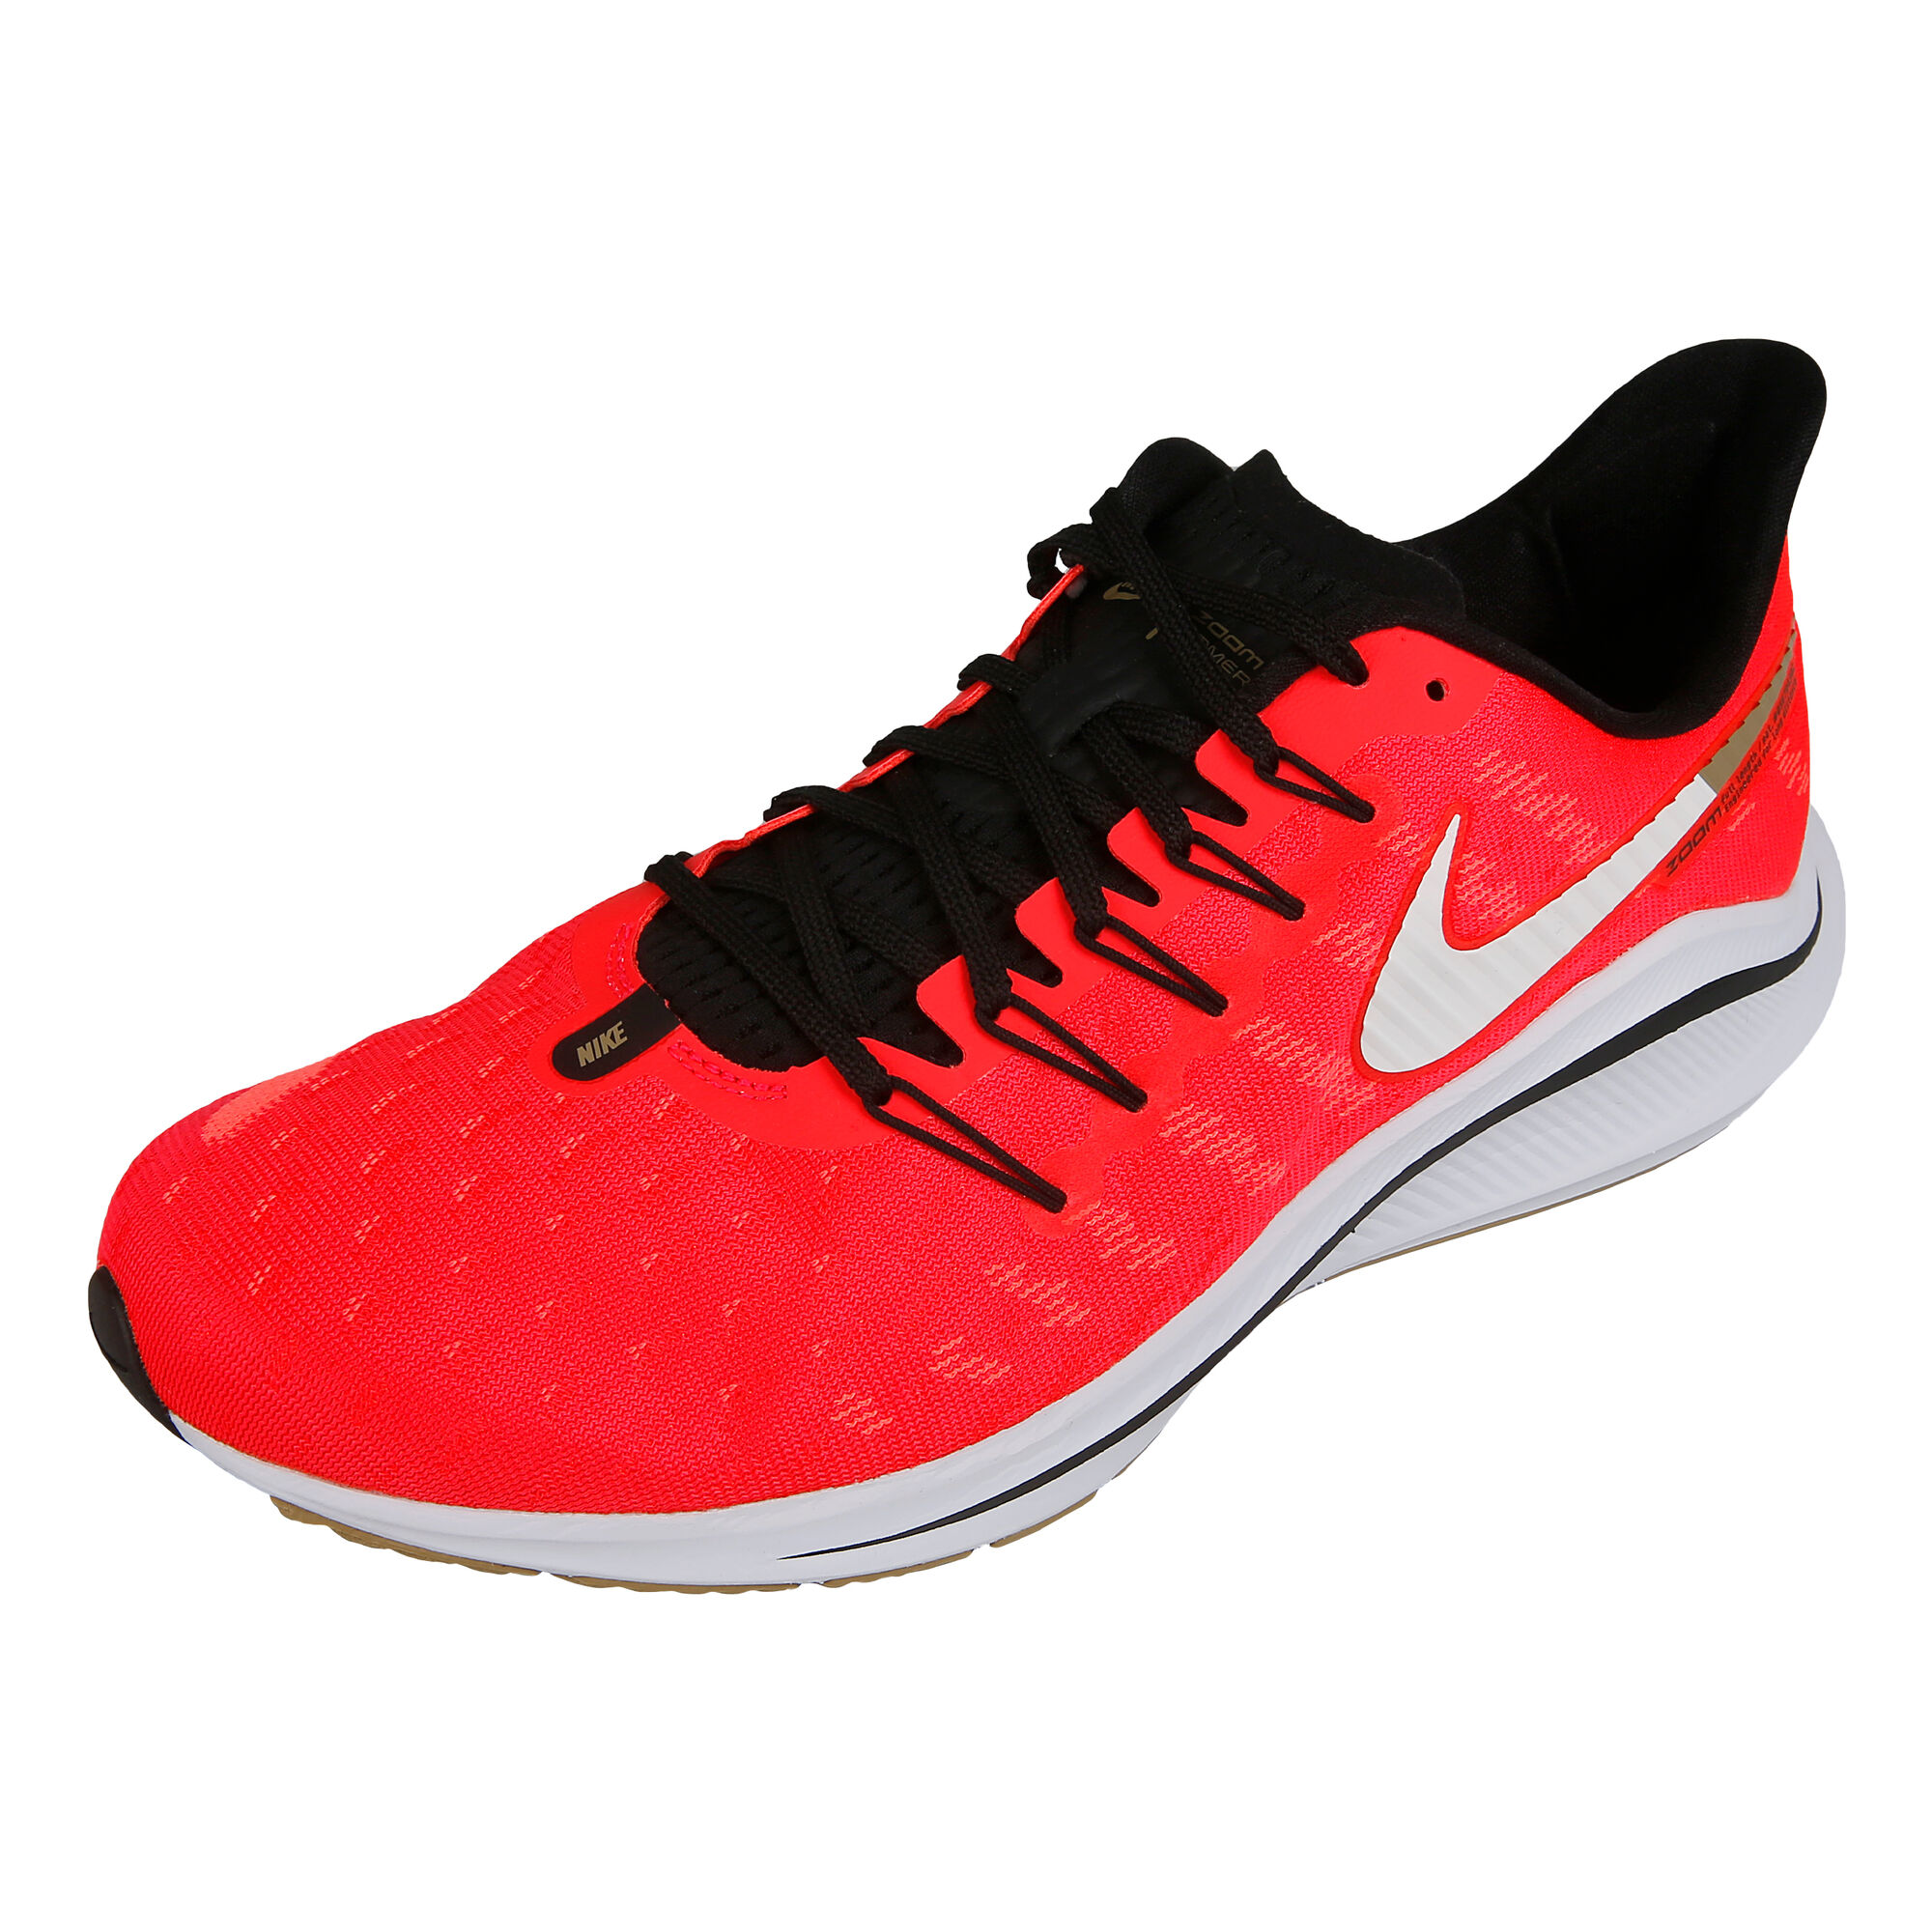 cb931d117bf buy Nike Air Zoom Vomero 14 Neutral Running Shoe Men - Coral, Black ...